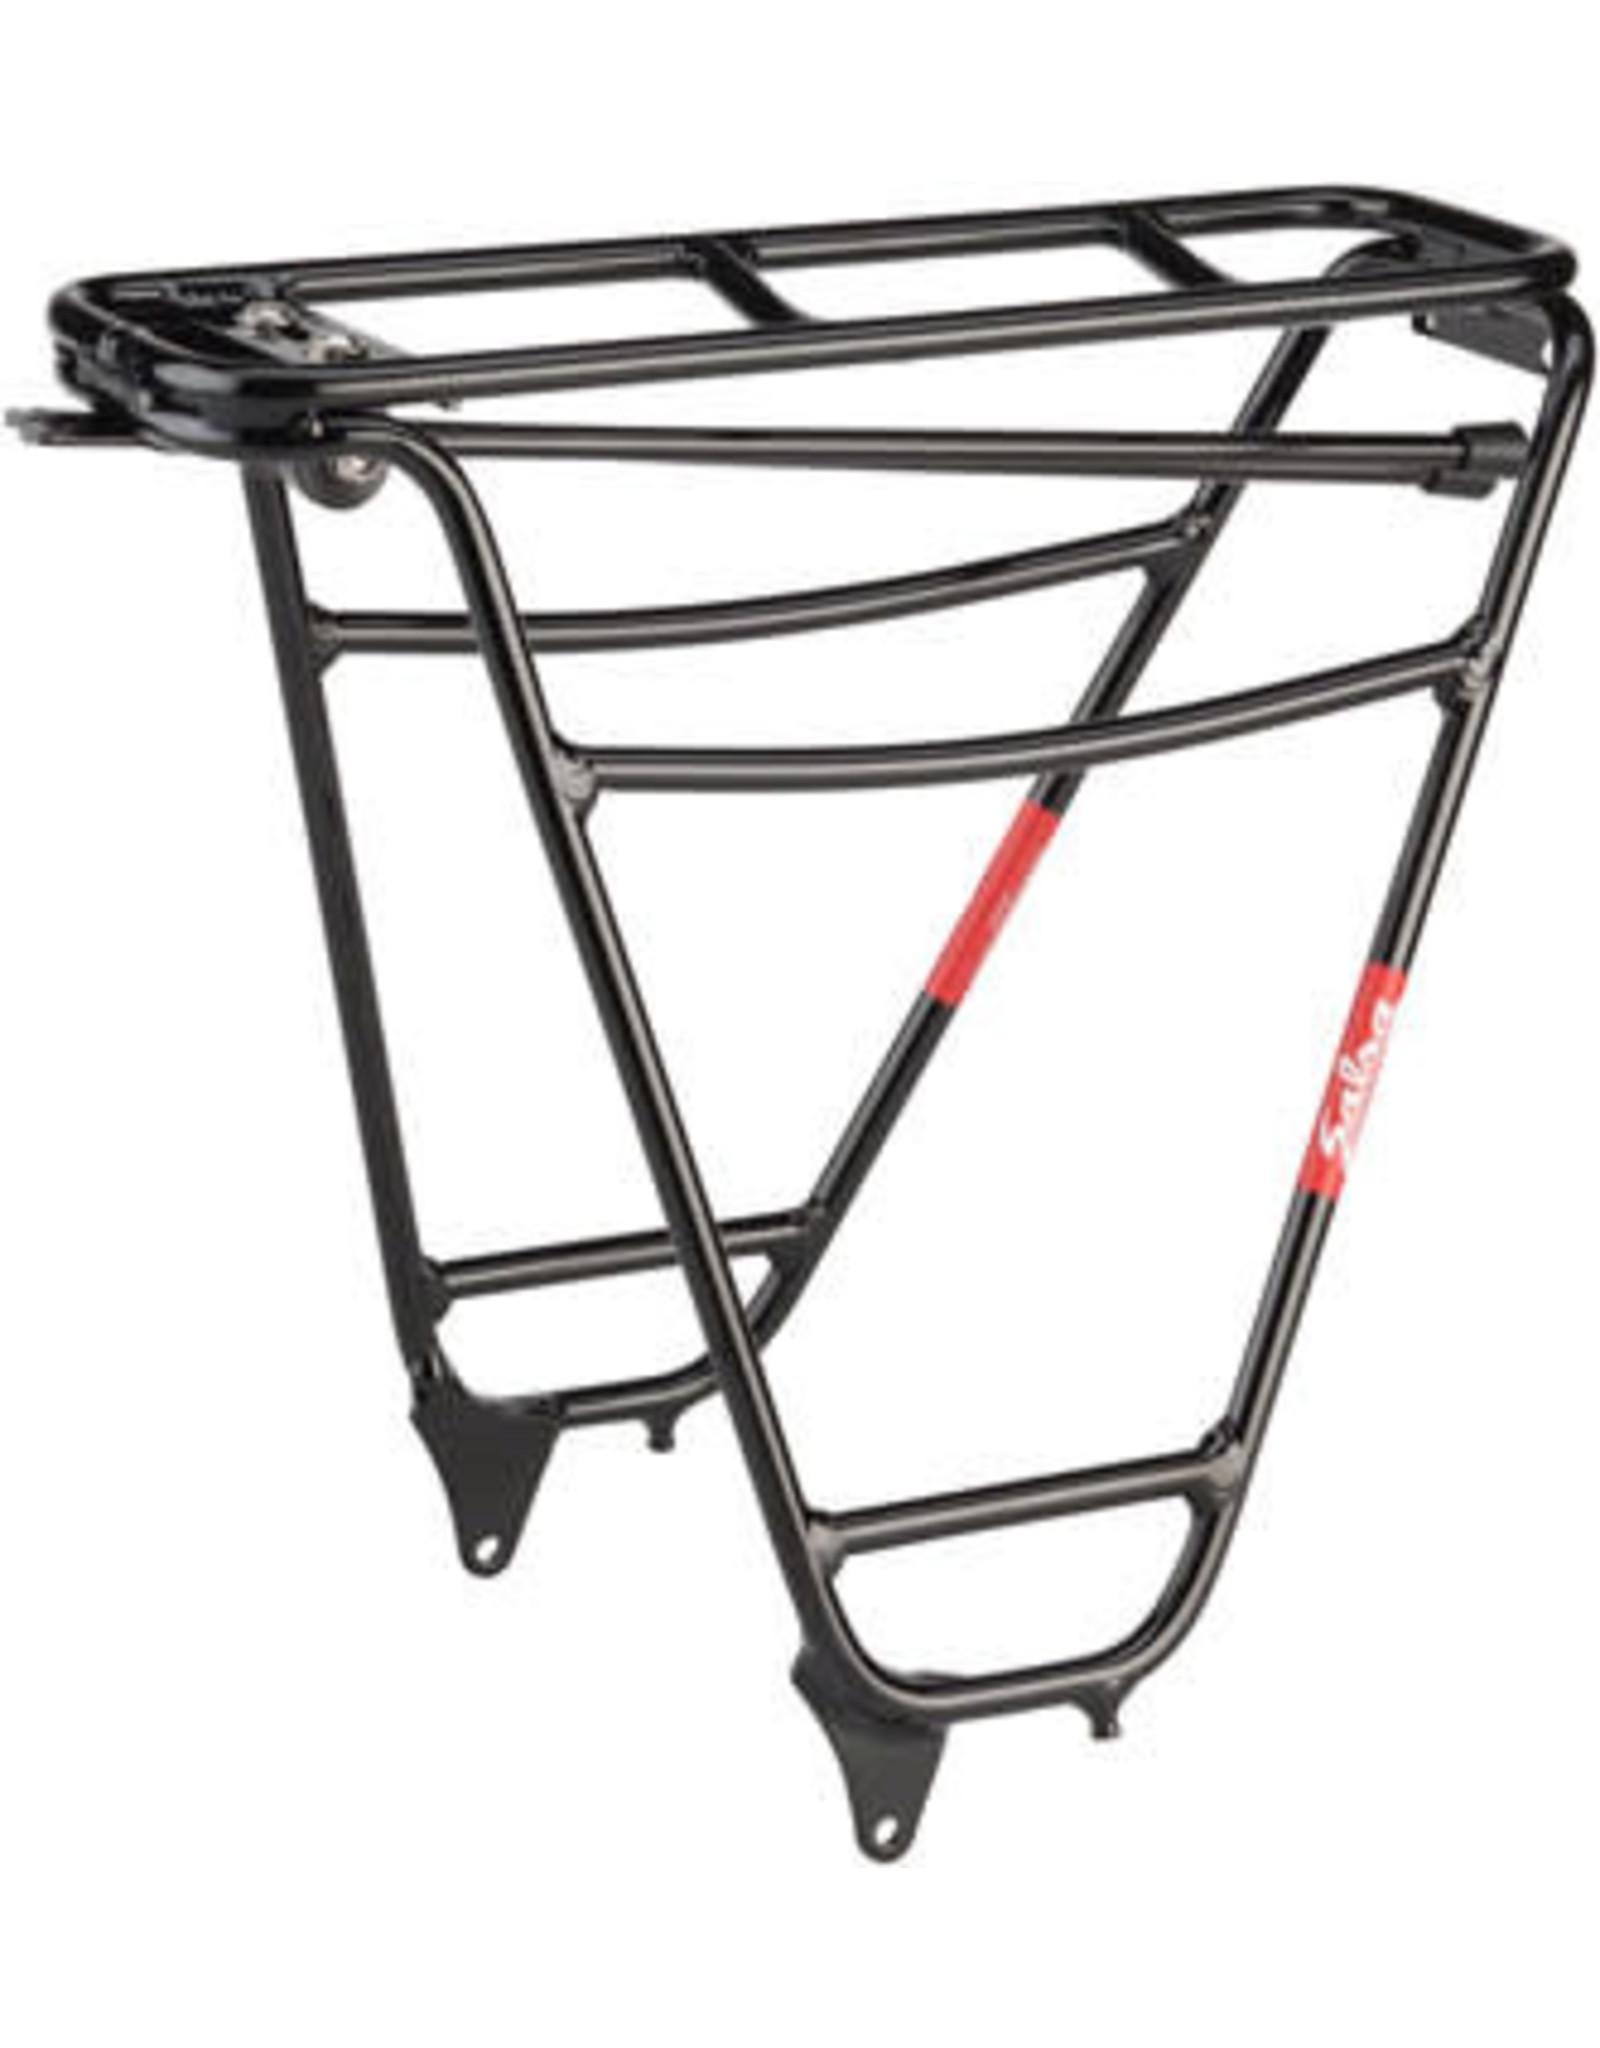 Salsa Alternator Rear Rack: 190 - 197mm Spacing - Black